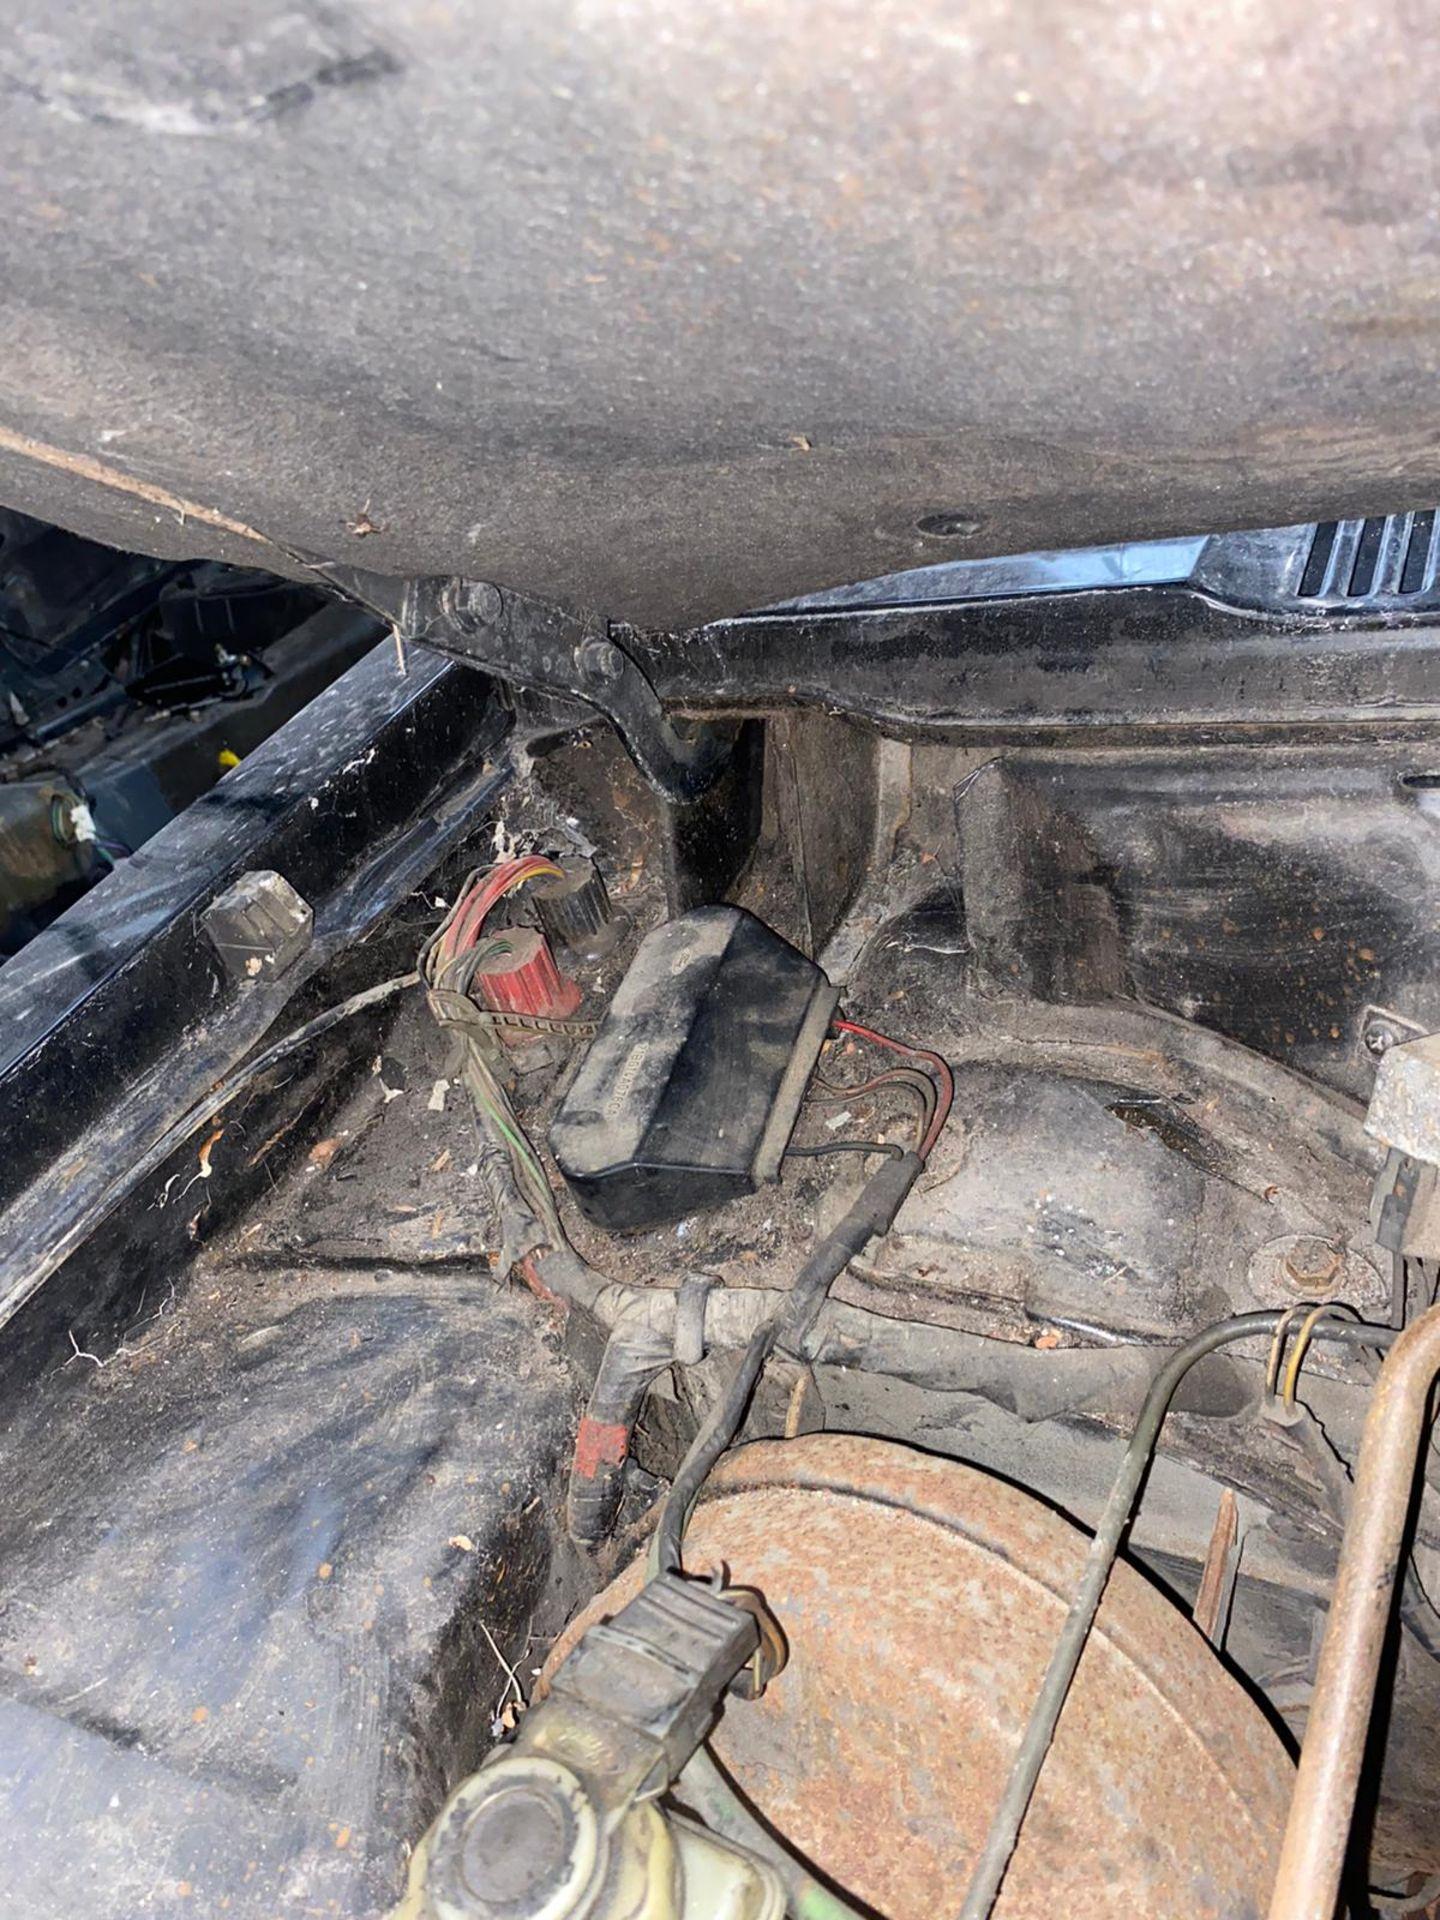 1986/C REG FORD CAPRI LASER AUTO 2.0 PETROL BLACK 3 DOOR *NO VAT* - Image 17 of 32